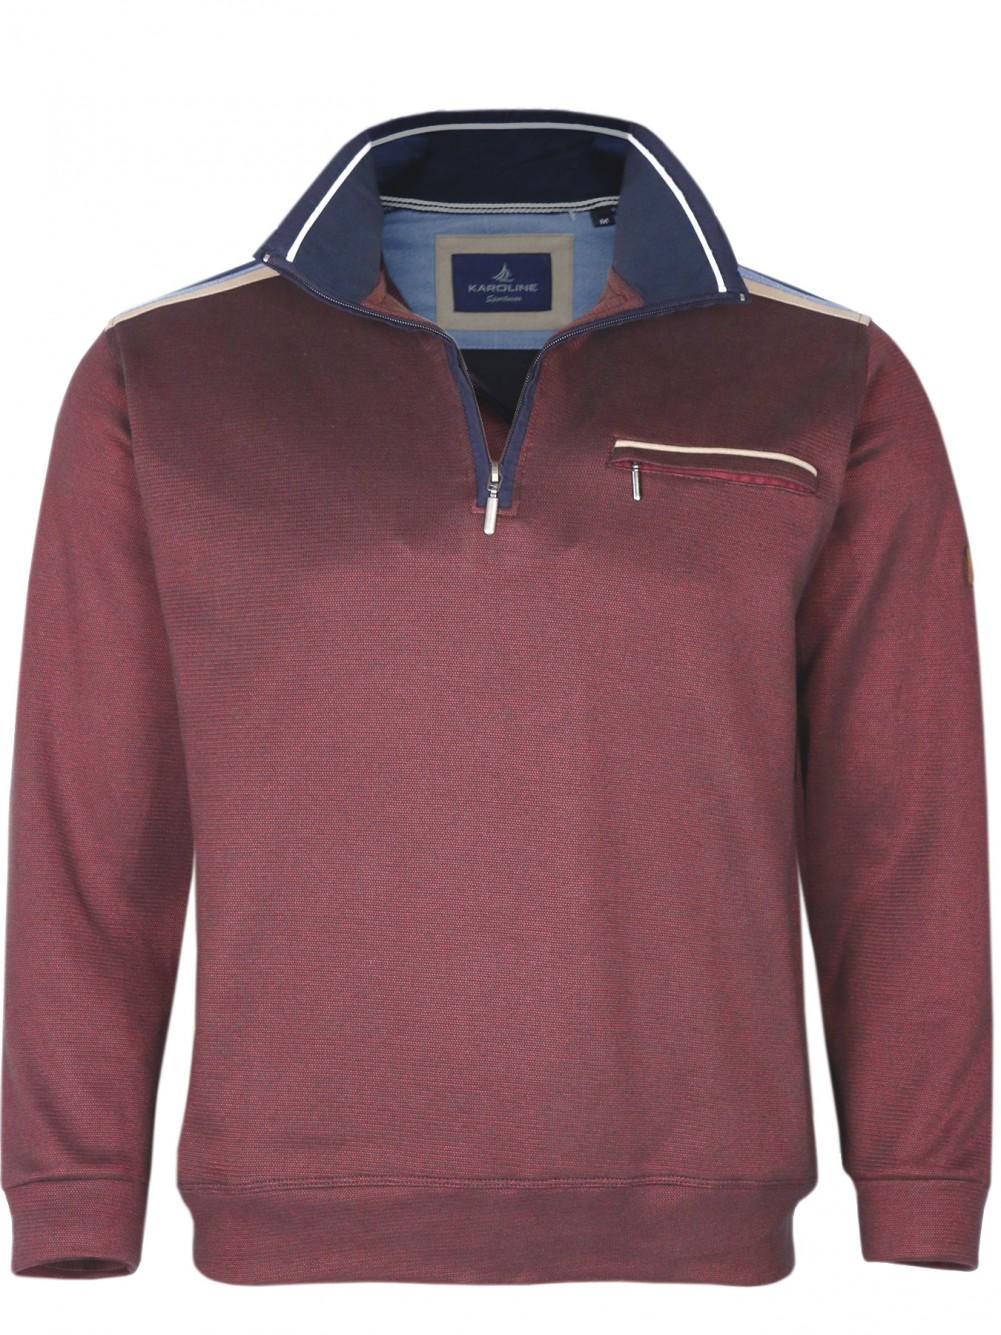 Herren Baumwoll-Piqué Polo-Shirt in Blouson-Form - Weinrot